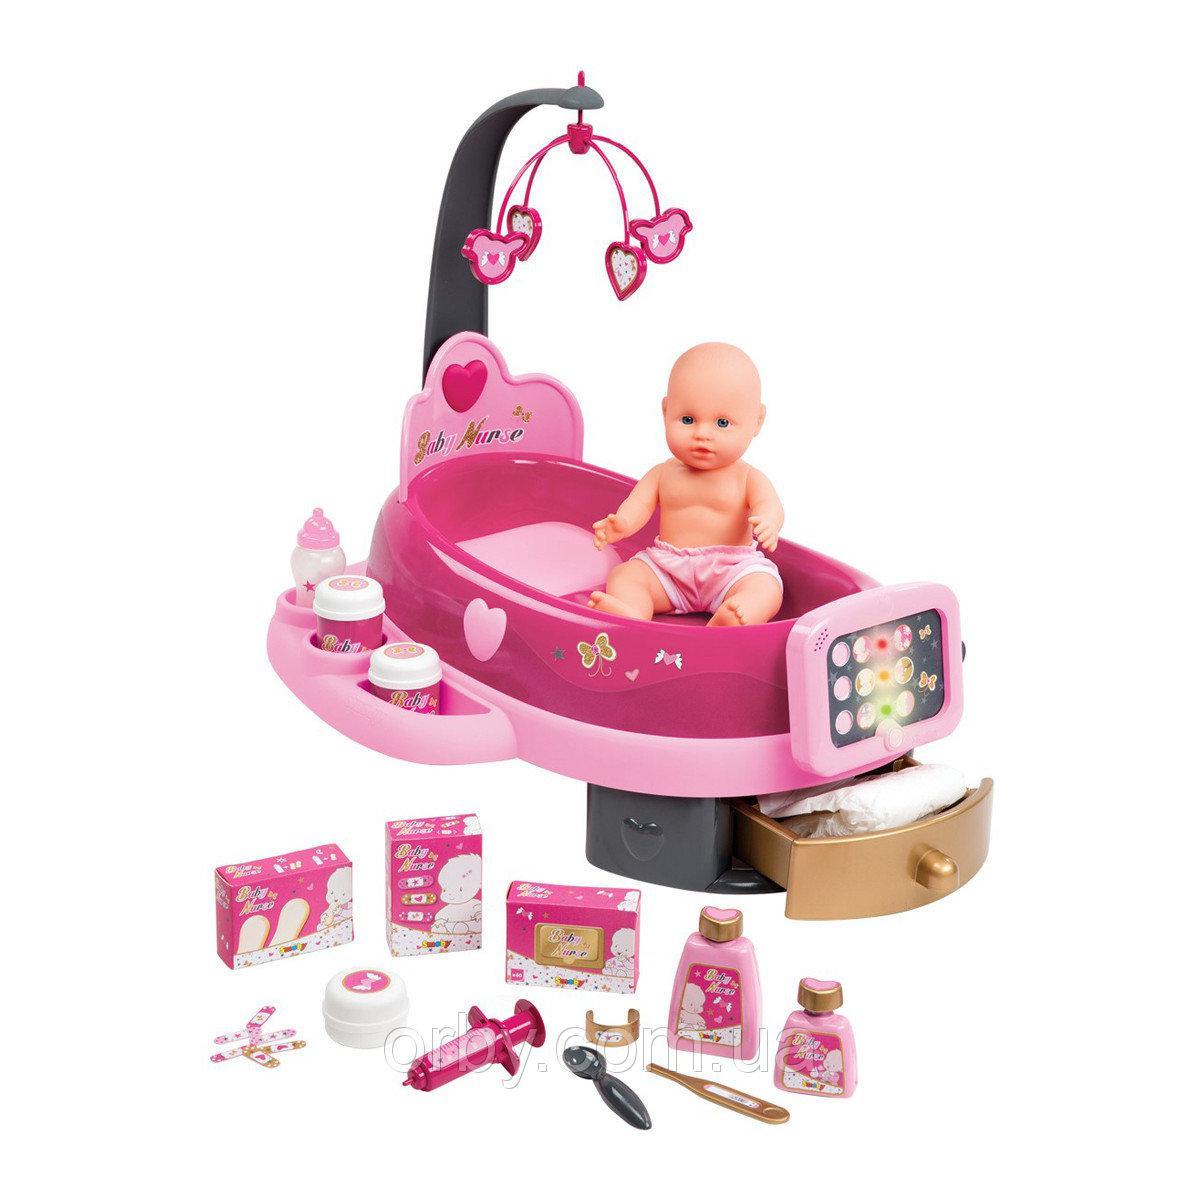 Уценка  центр Smoby Baby Nurse для ухода за куклой